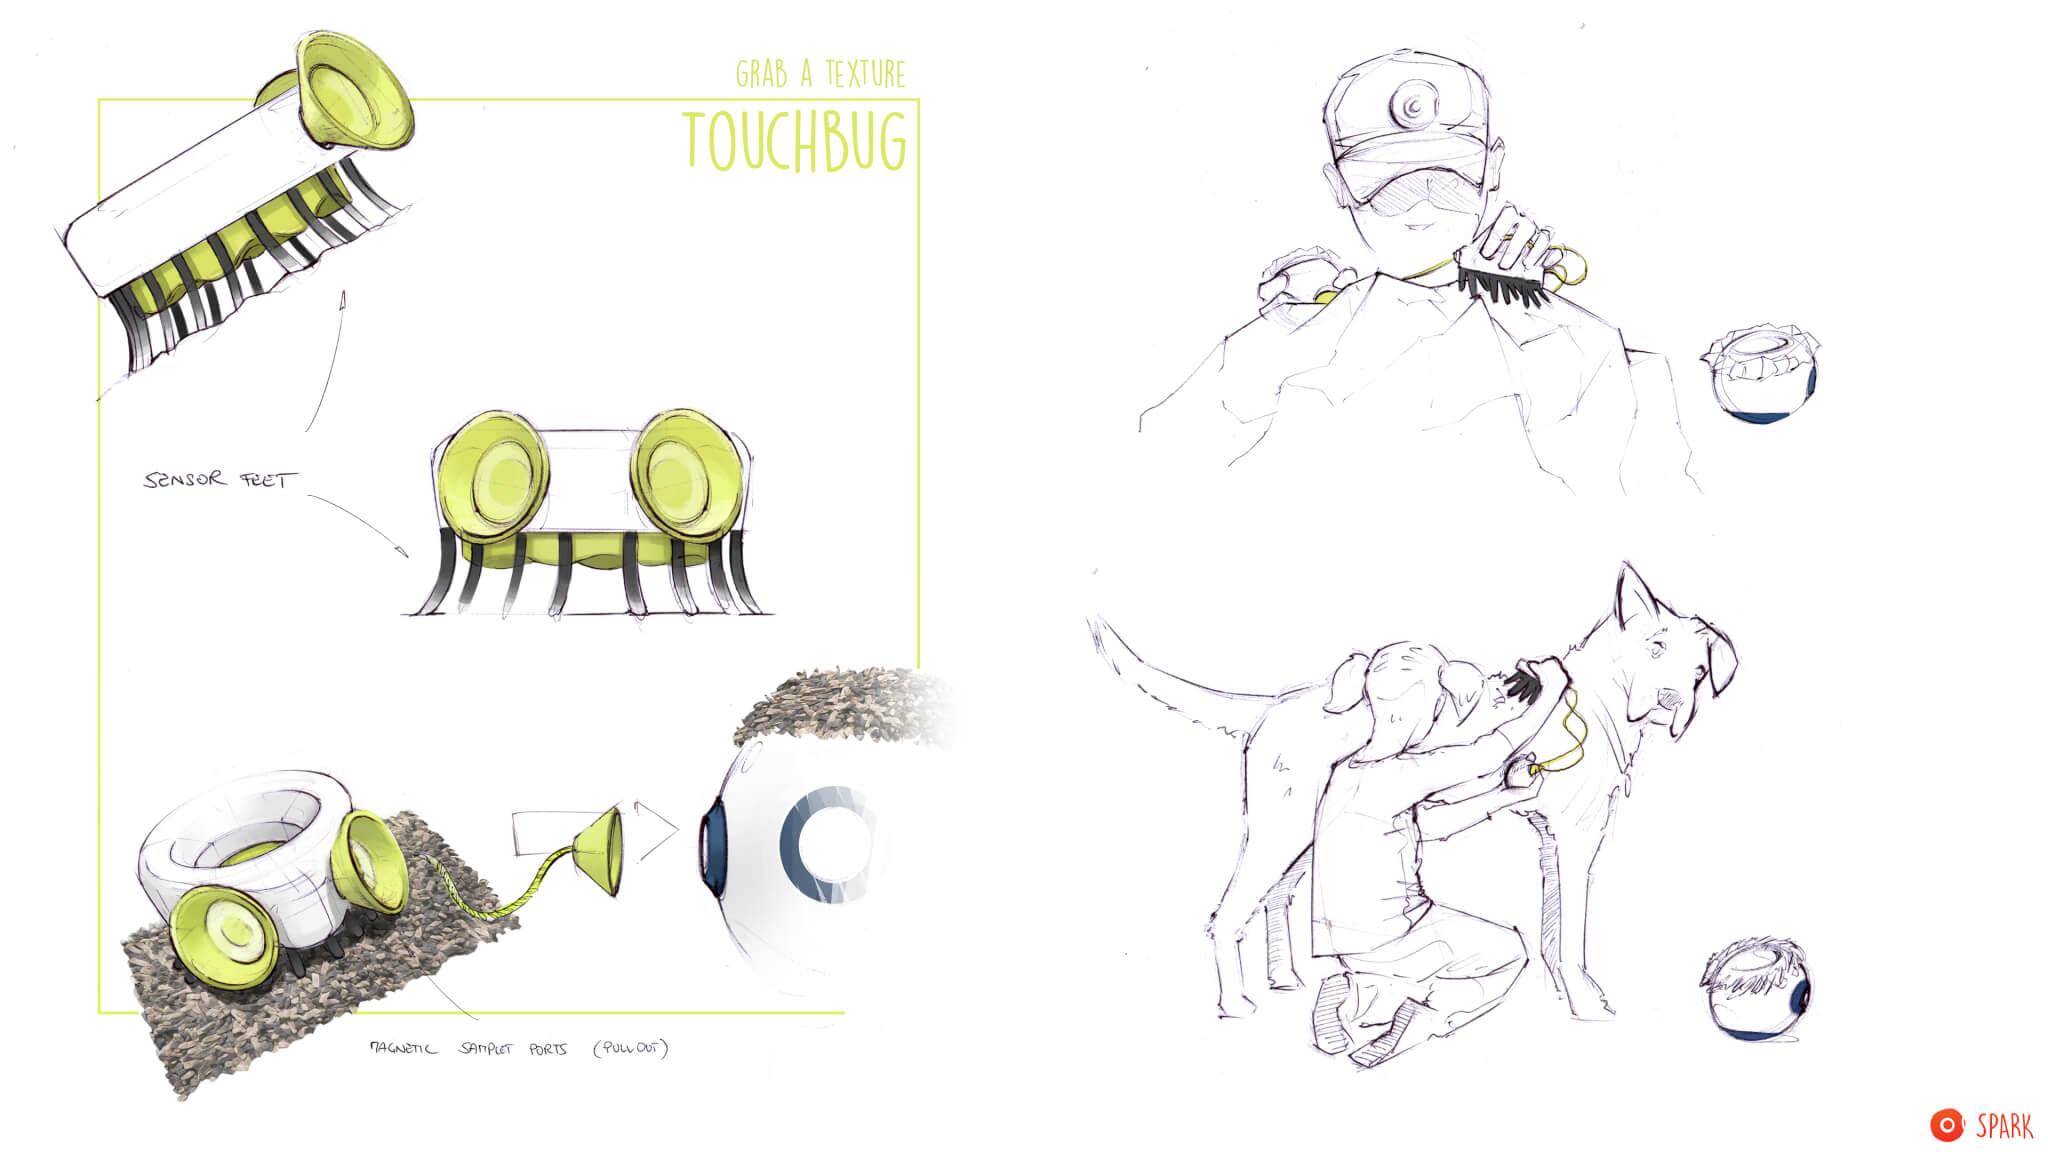 Touchbug